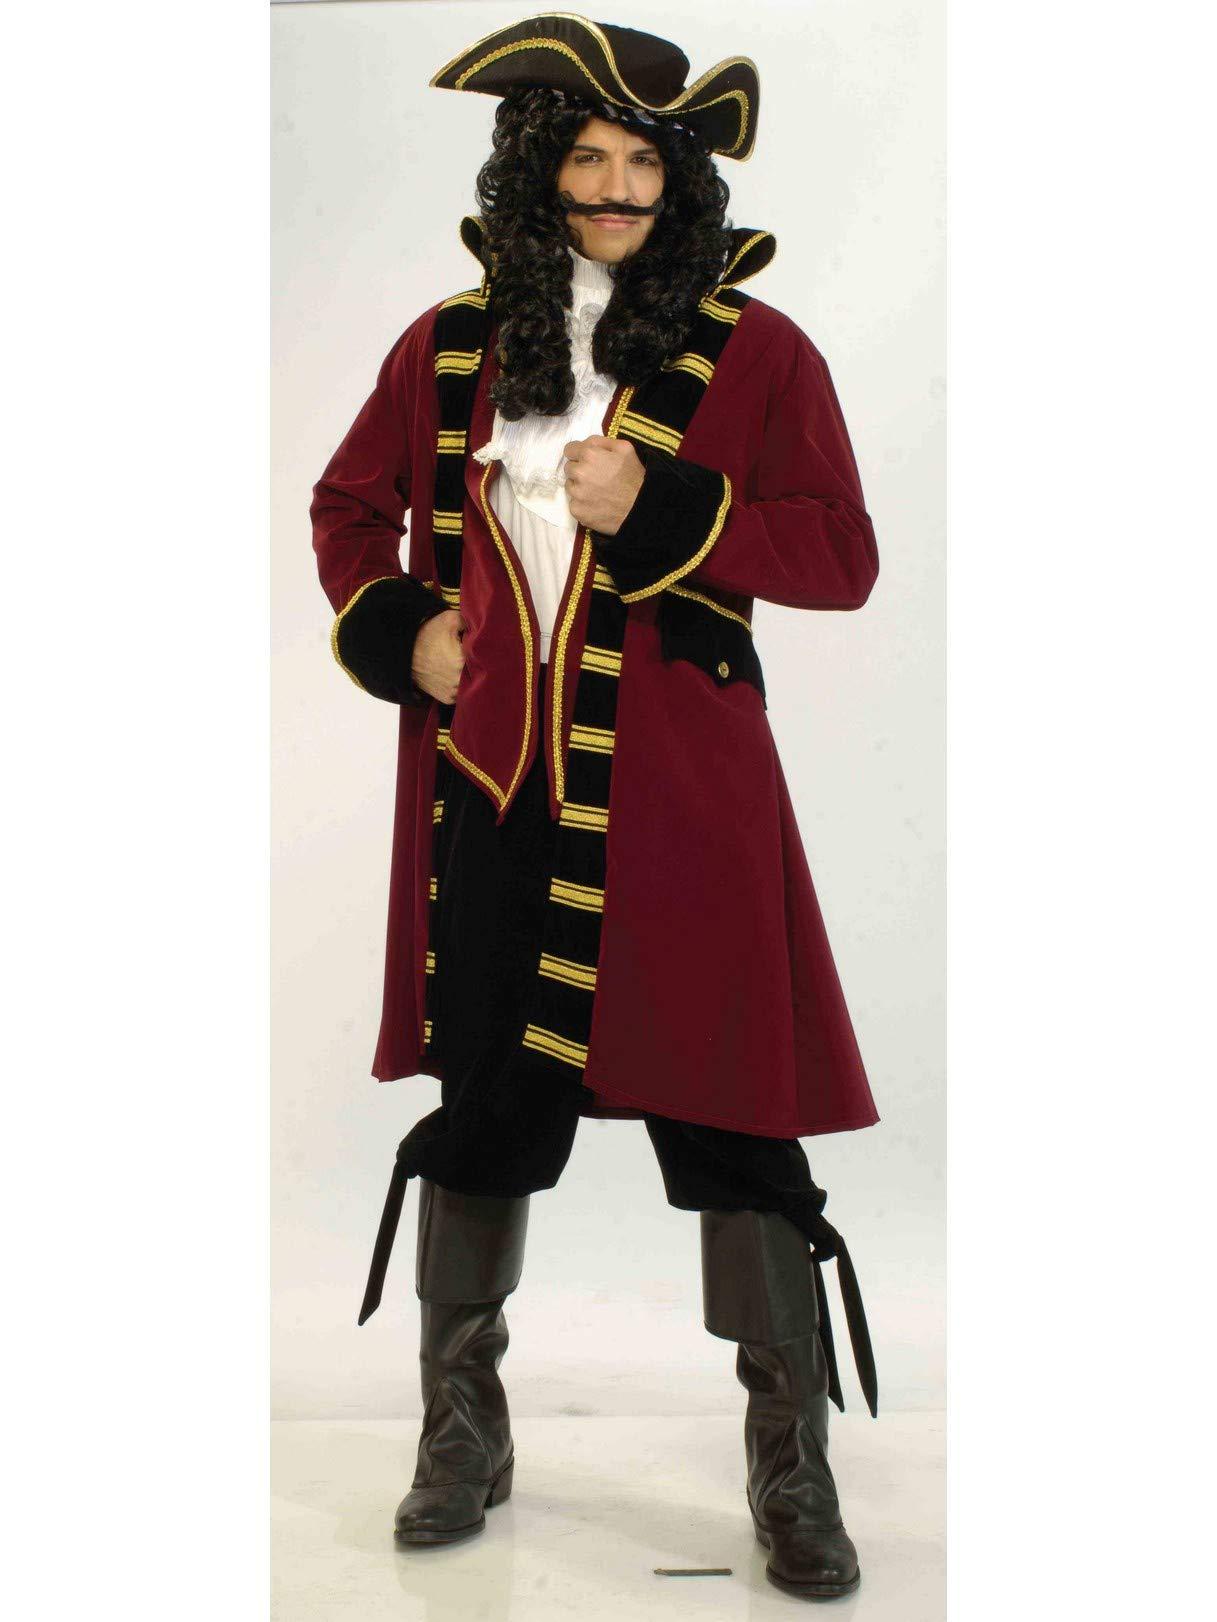 Forum Designer Deluxe Pirate Captain Costume, Multi, Extra Large by Forum Novelties (Image #1)